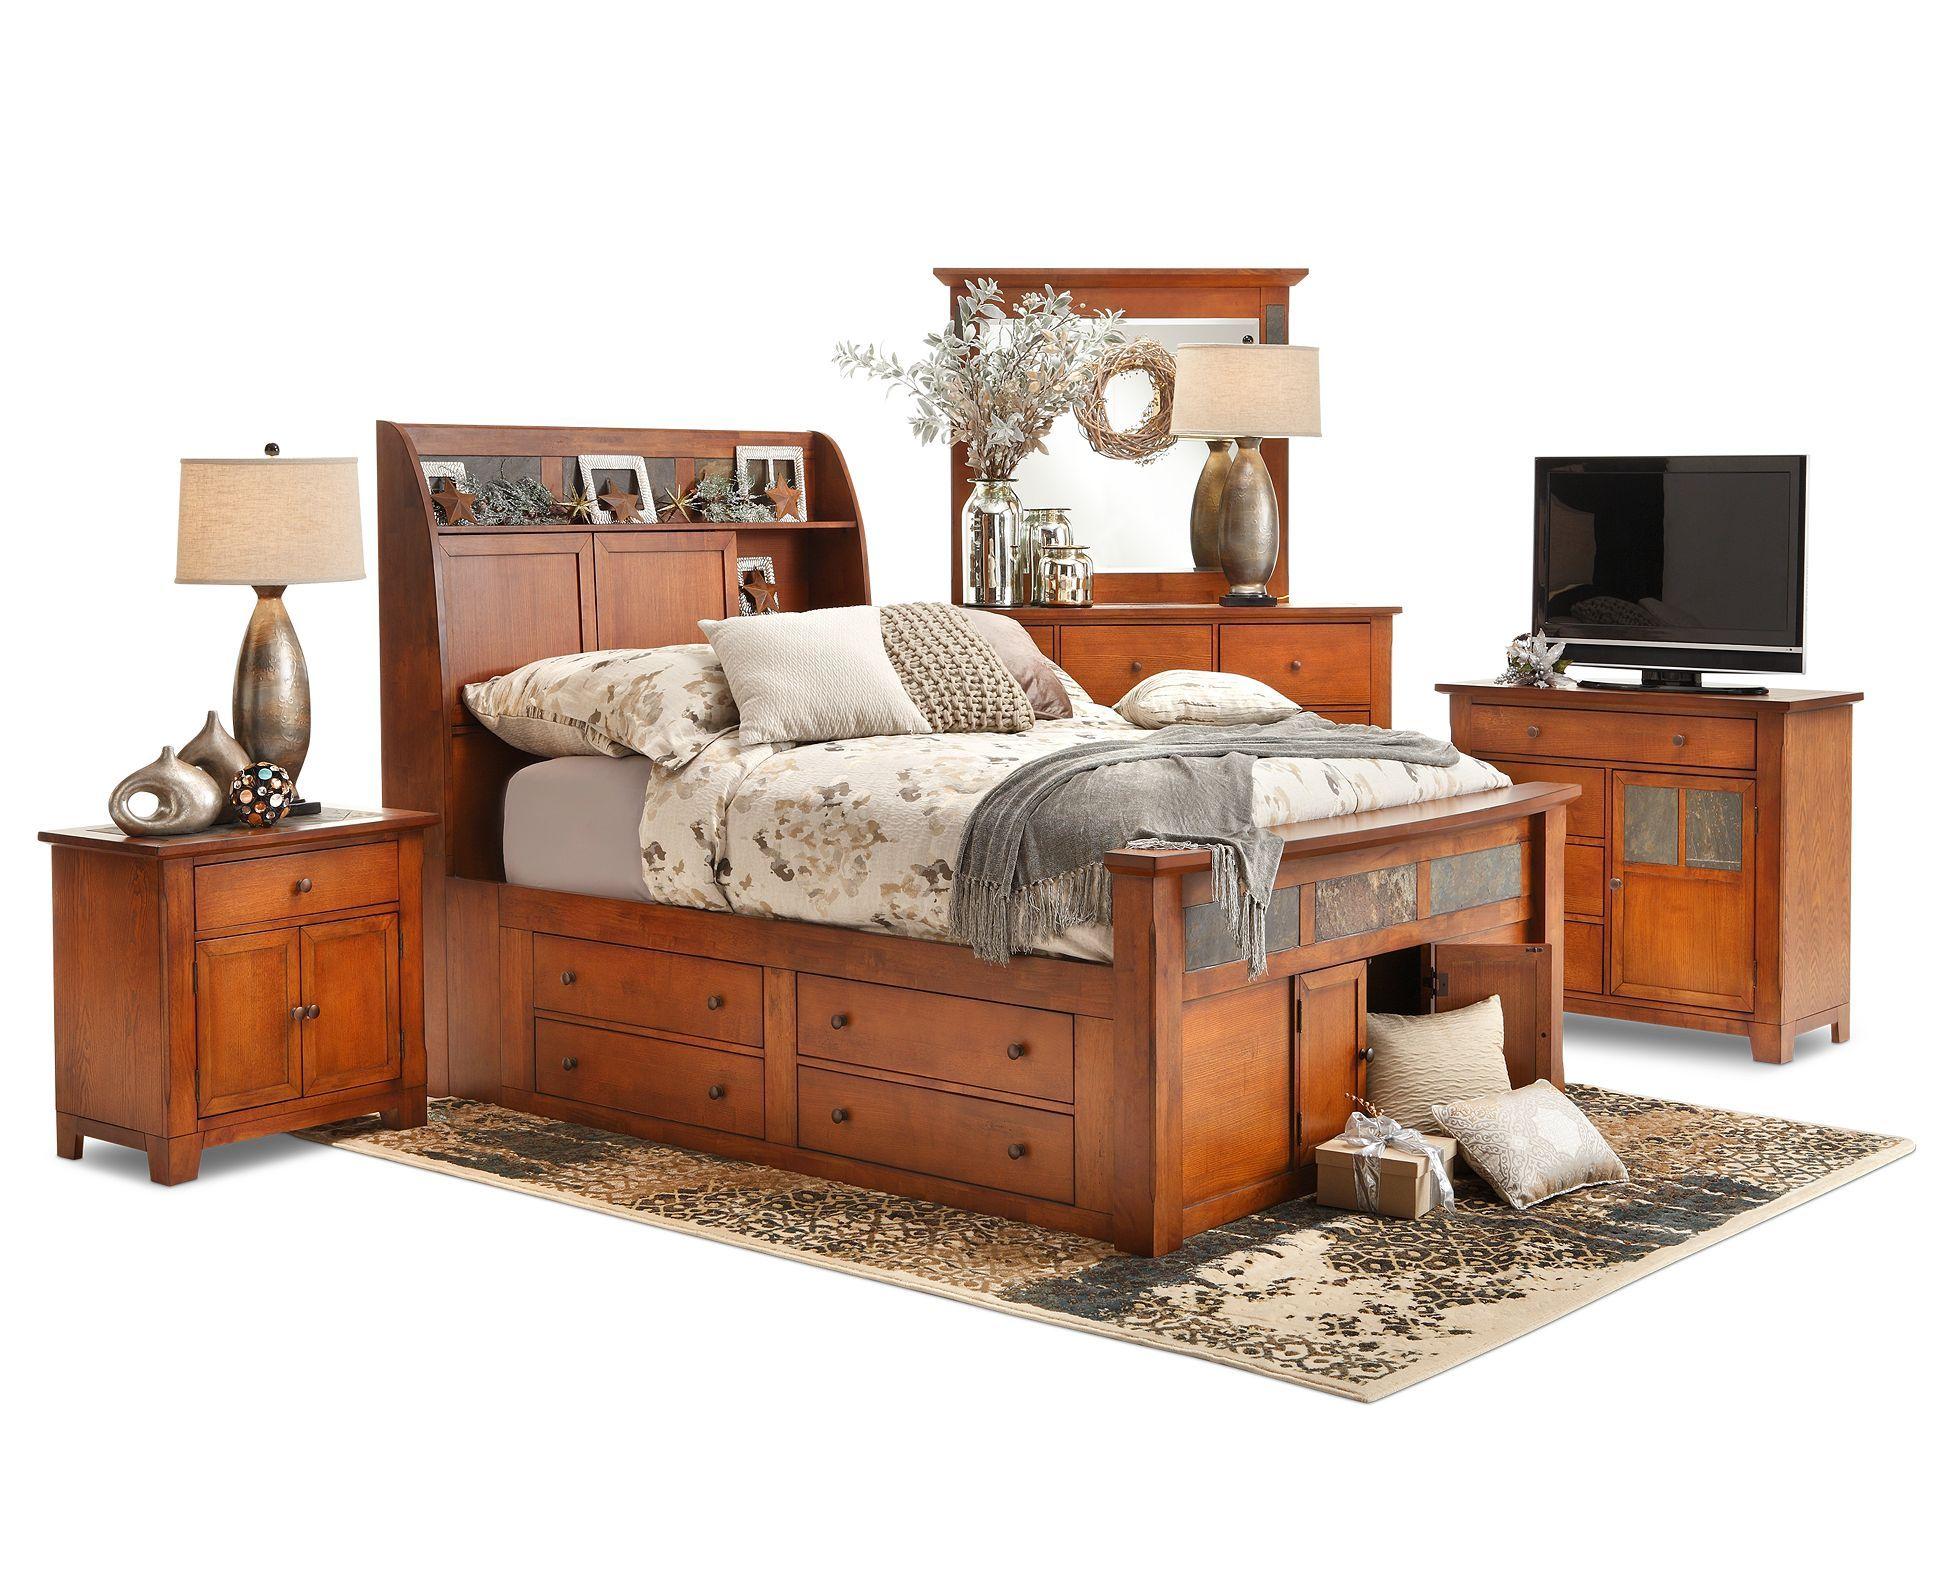 Aspen Storage Bed - Furniture Row  Rowe furniture, Furniture, Bed